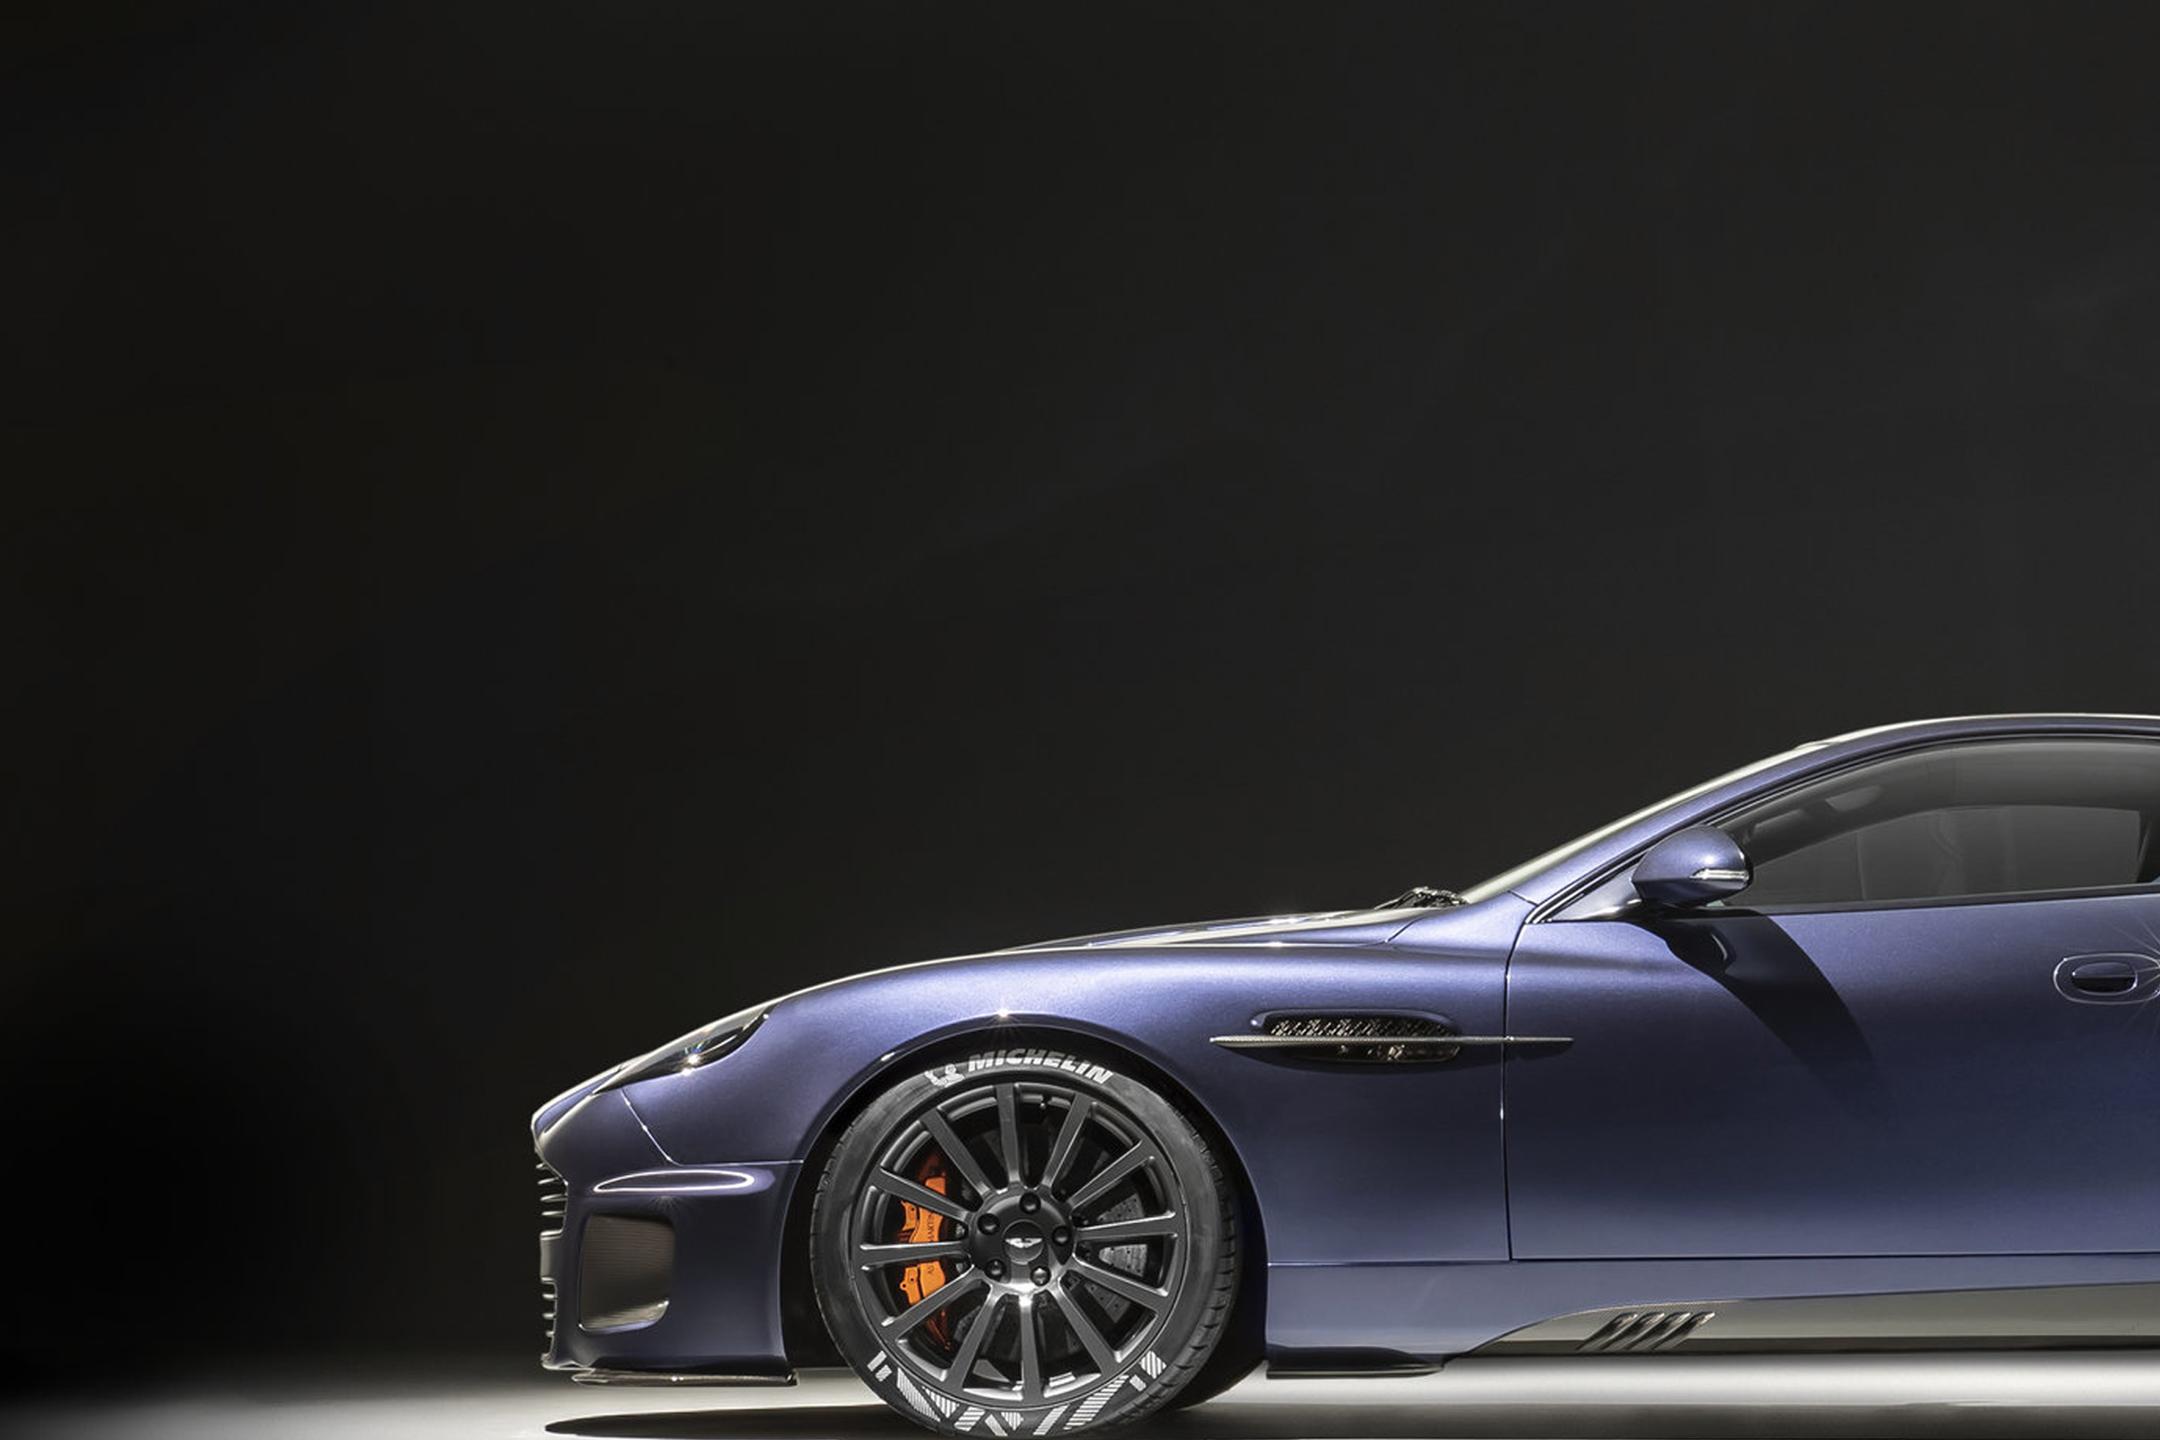 Aston Martin Vanquish 25 by CALLUM - 2019 - front wheel / jante avant